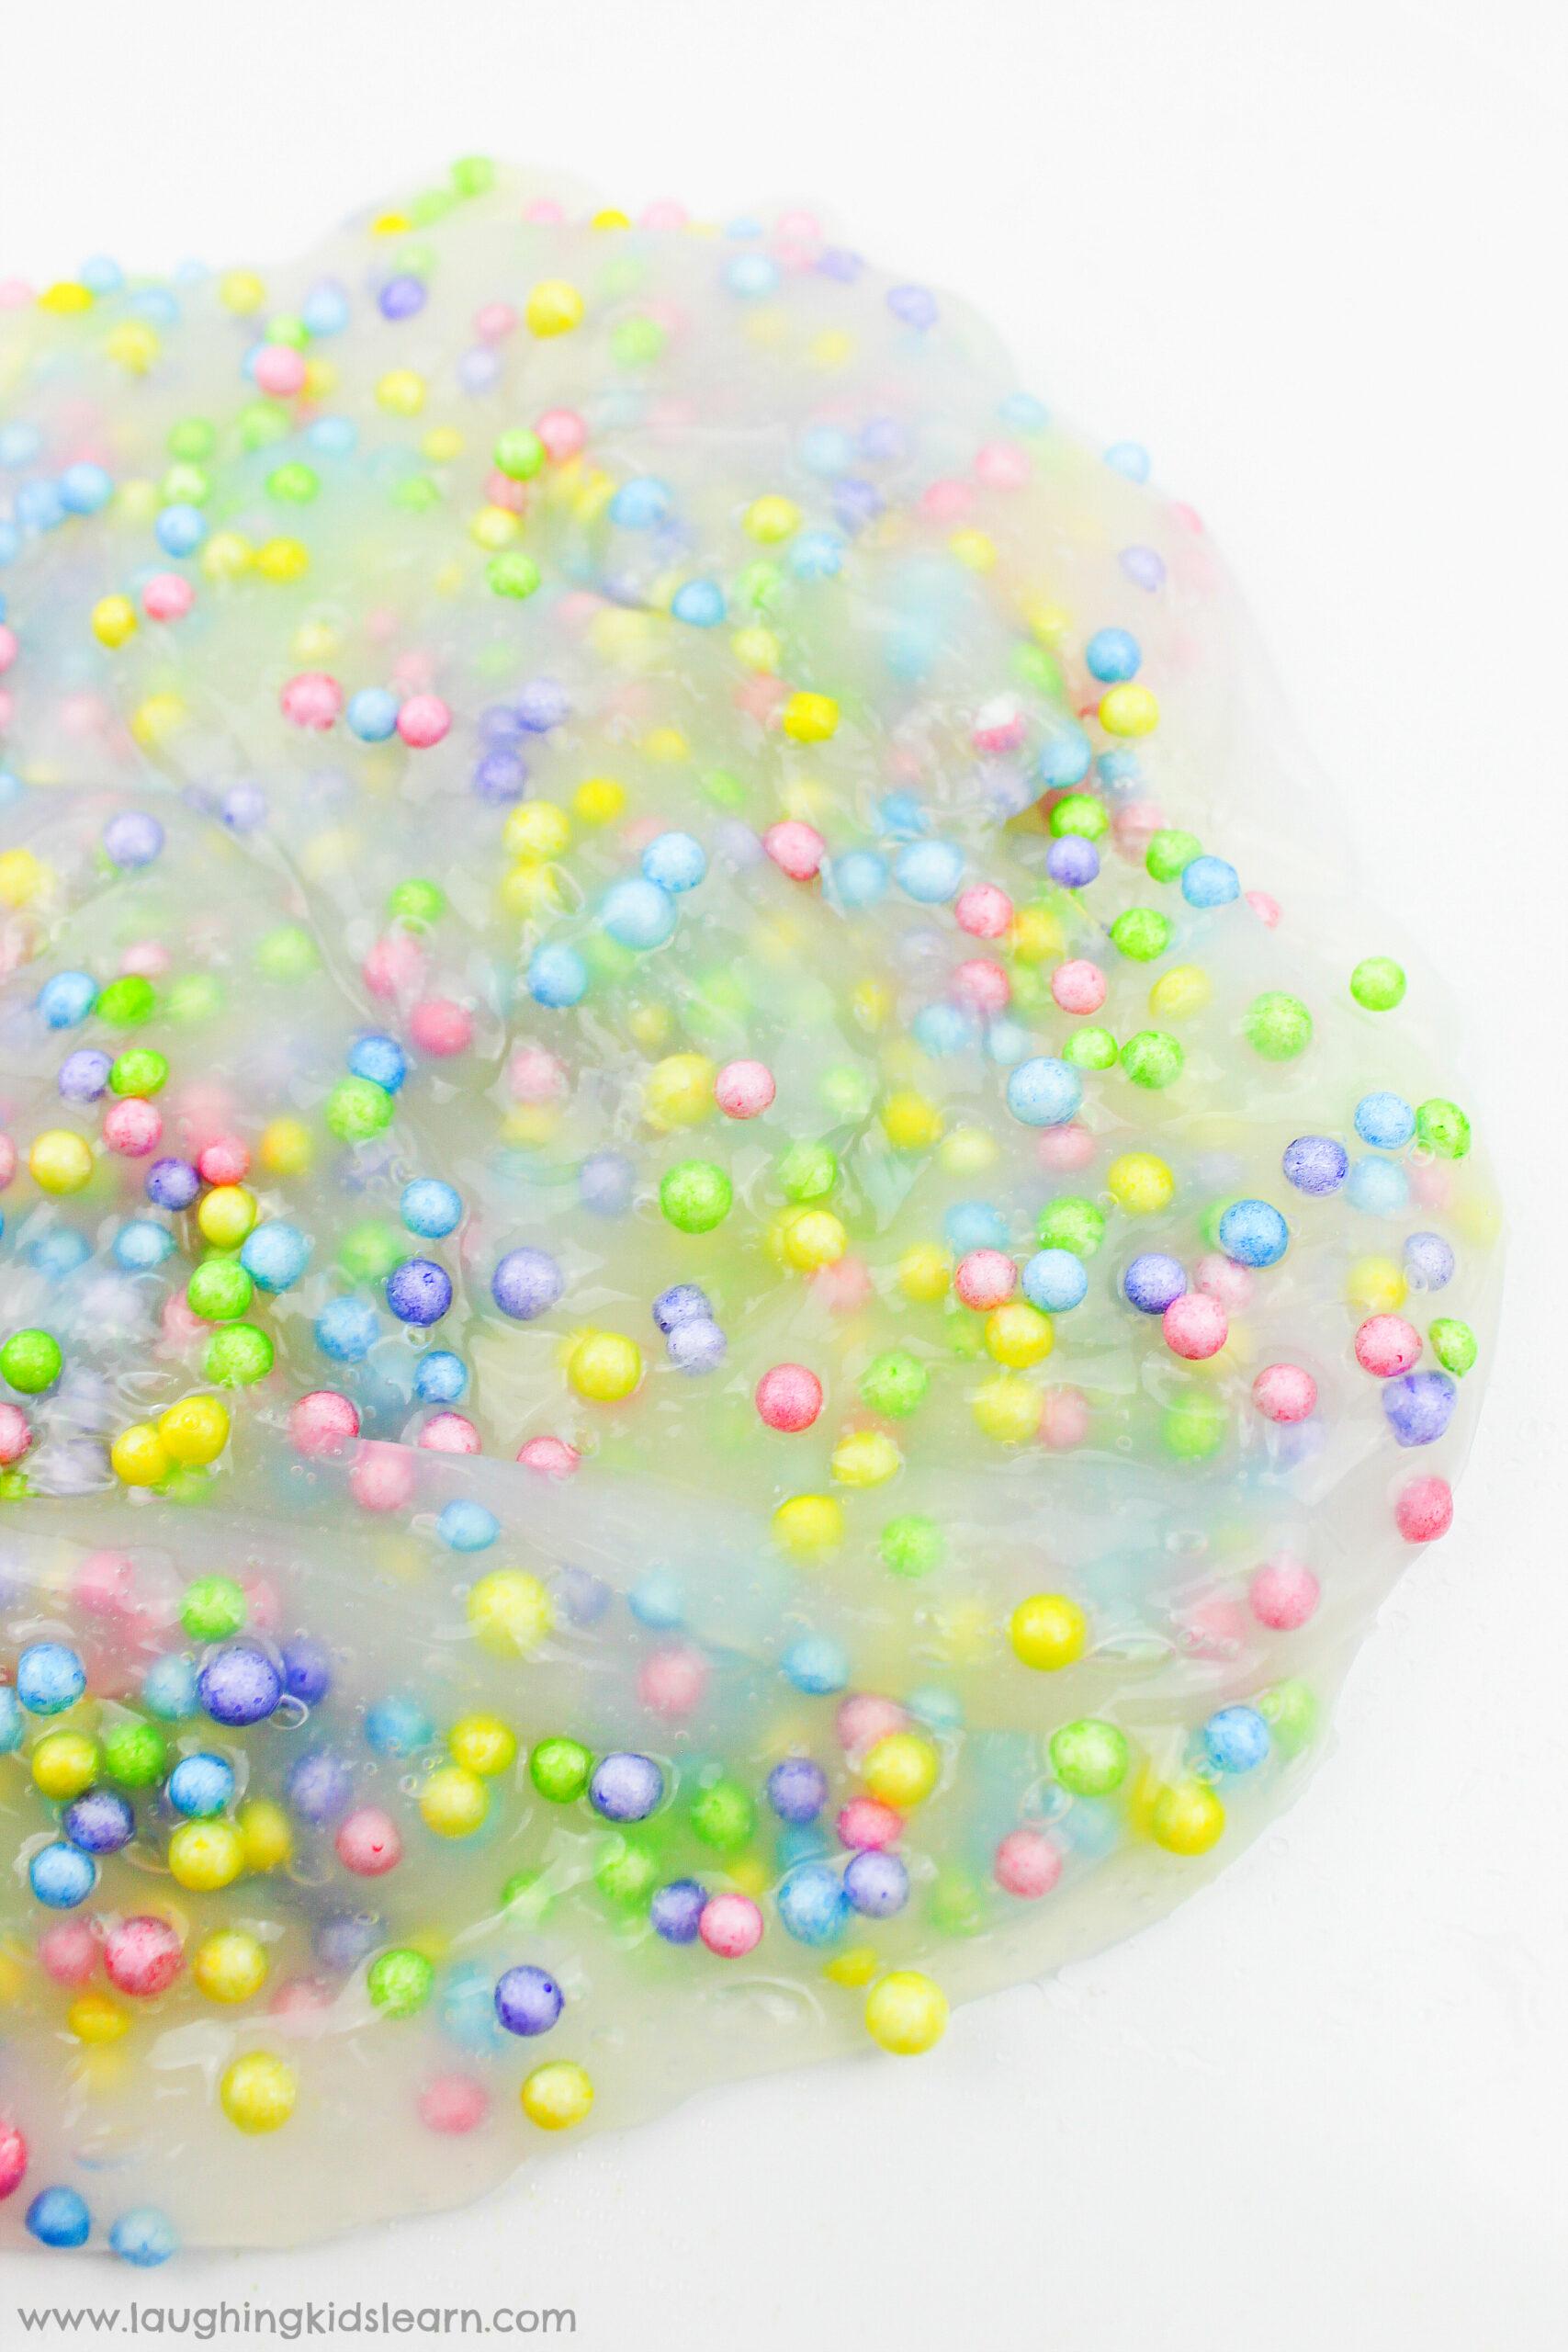 simple slime recipe with foam balls is great for sensory play. Learn how to make it. #slime #sensoryslime #foamslime #slimerecipe #kidsscience #simpleslime #glueslime #elmerglue #makingslime #makeslime #recipeforslime #funslime #texturedslime #sensoryplay #sensoryprocessing #rainbowcolors #rainbowslime colorfulslime #easyslimerecipe #funslime #makeslime #styrofoamballs #stretchyslime #kbn #floam #funtomakeslime #threeingredients #simplerecipeforkids #kidsplay #messyplay #pastelcolors